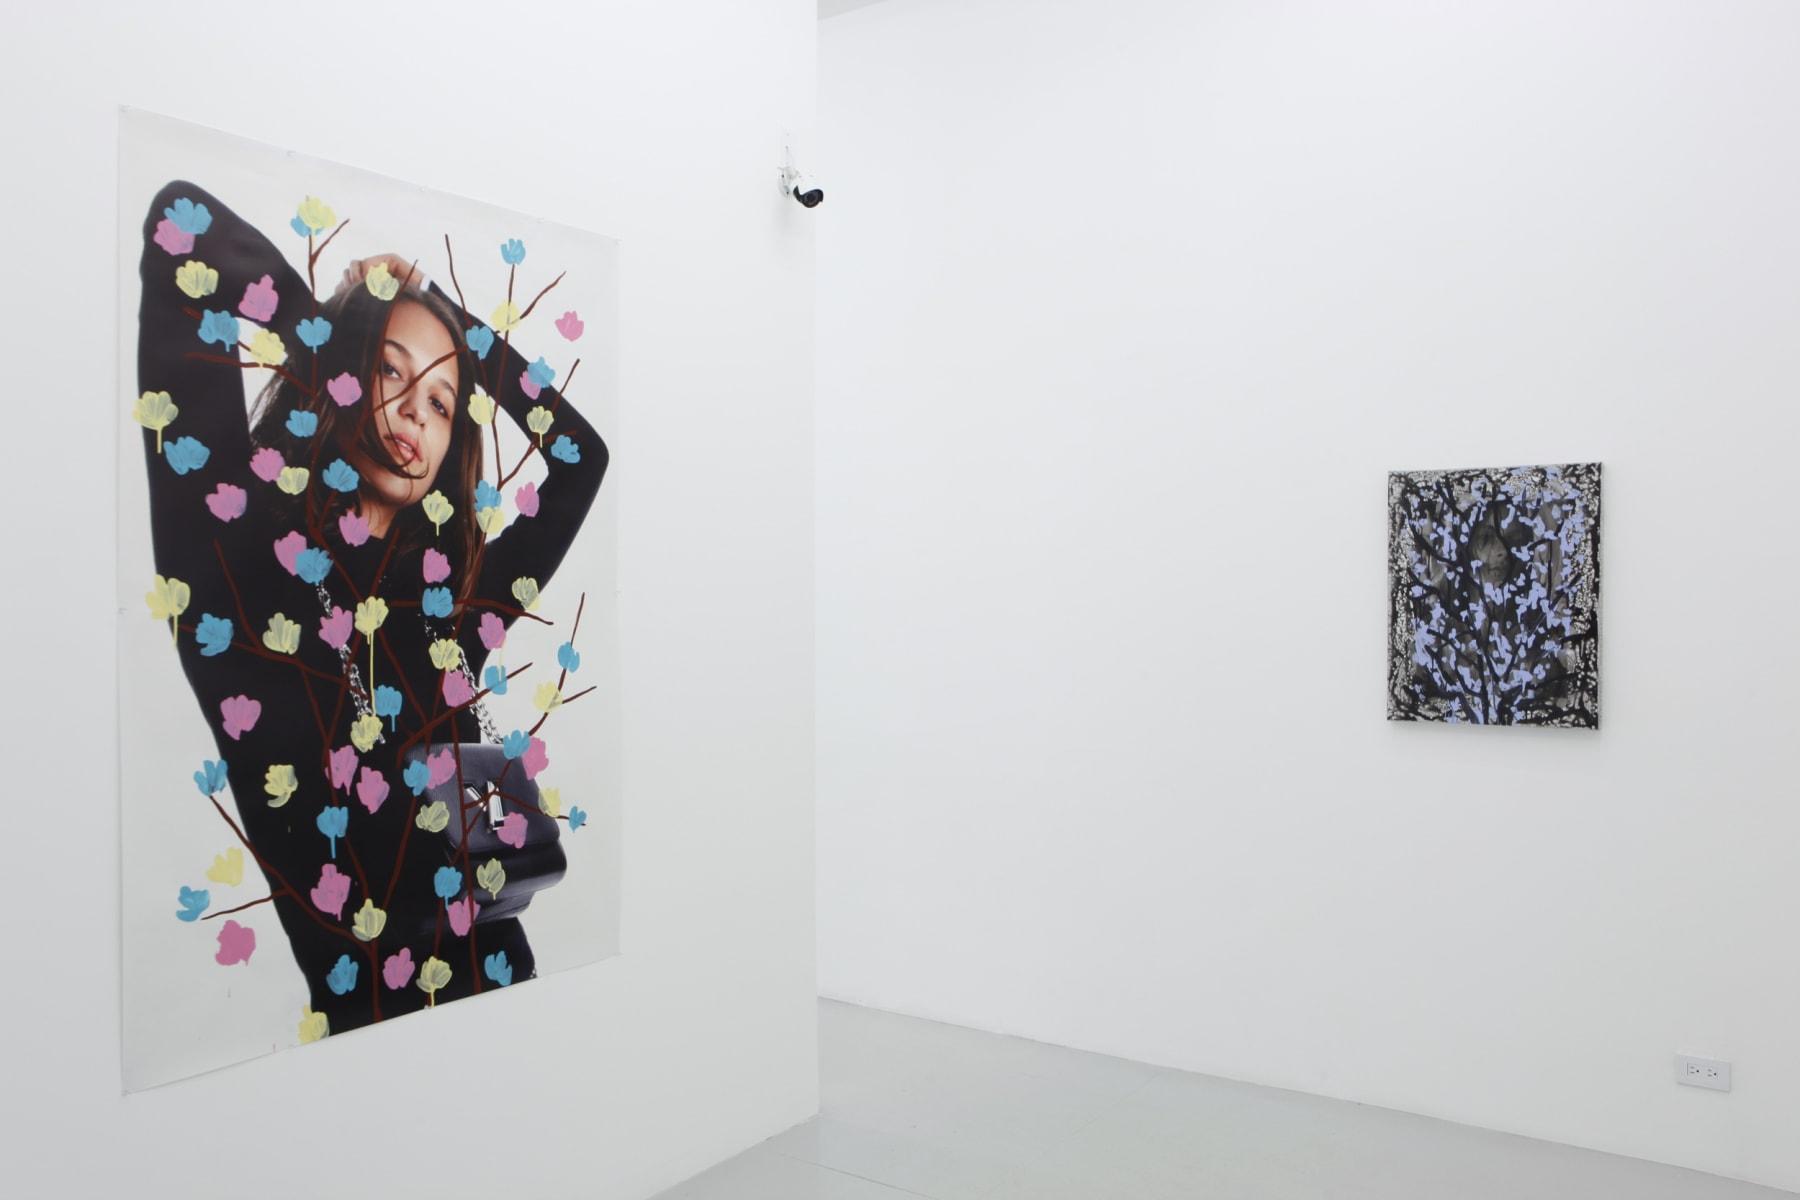 Danziger Gallery, New York, New York